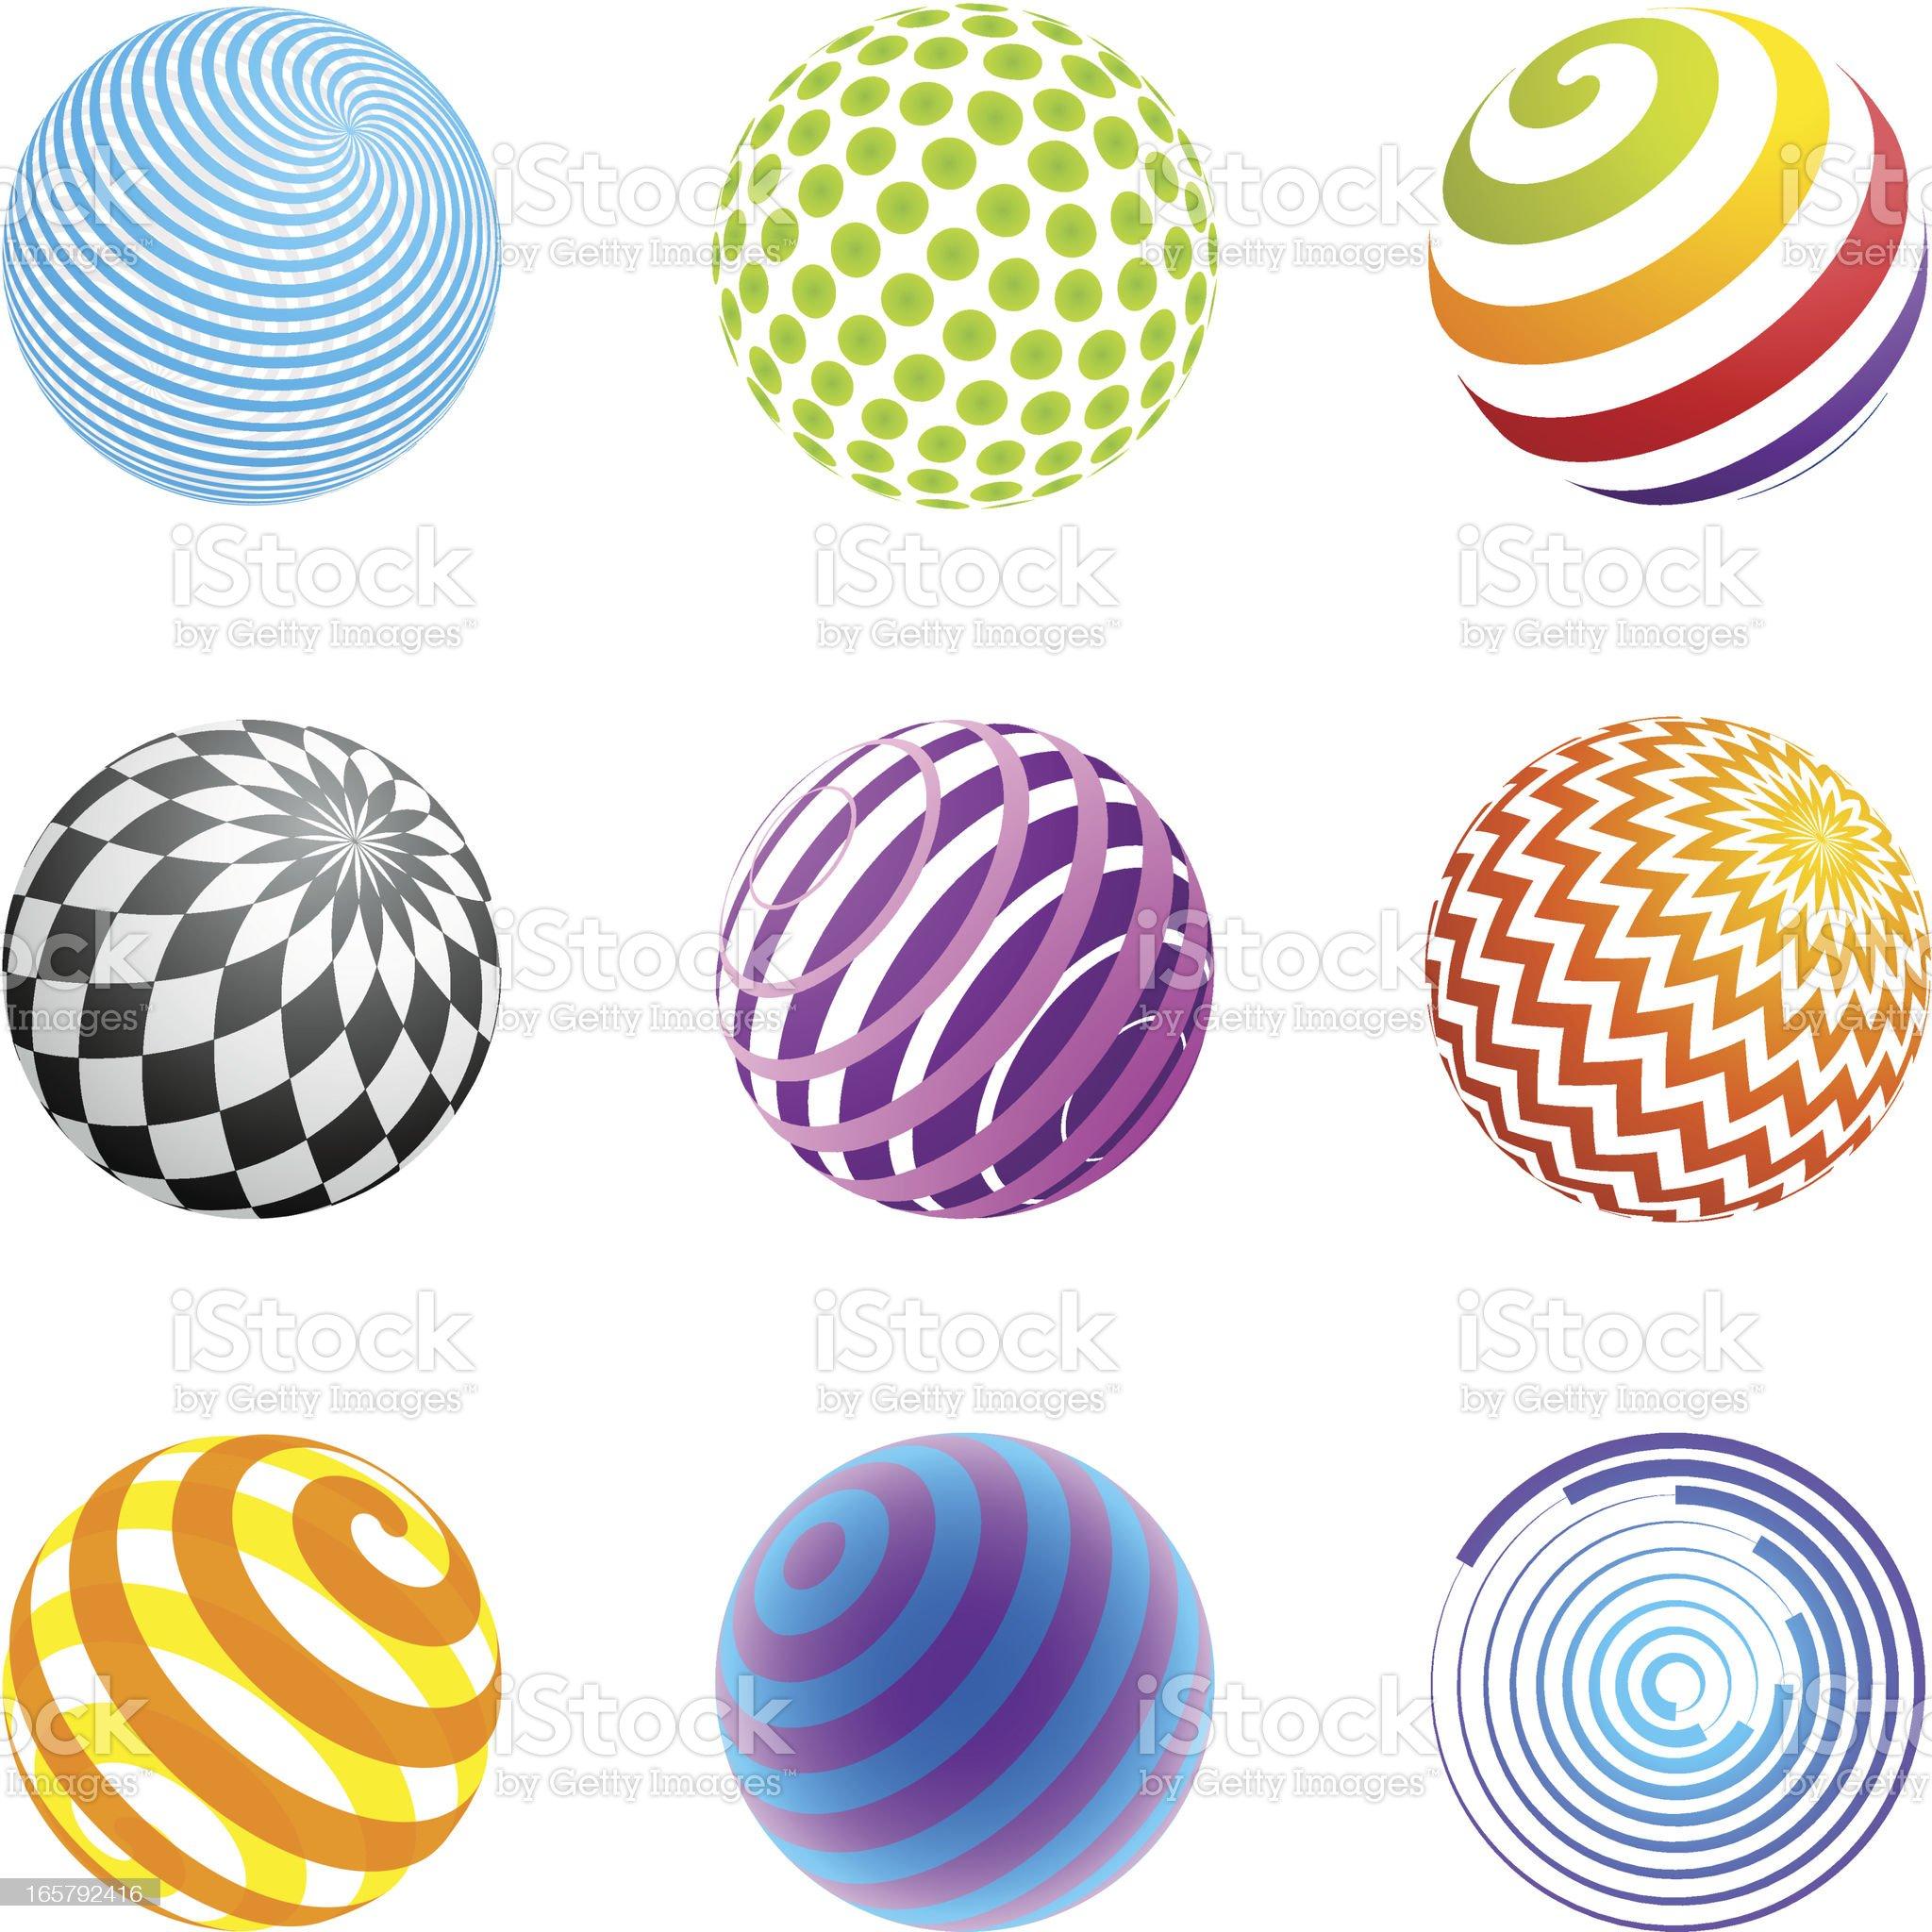 Design Elements | sphere set royalty-free stock vector art